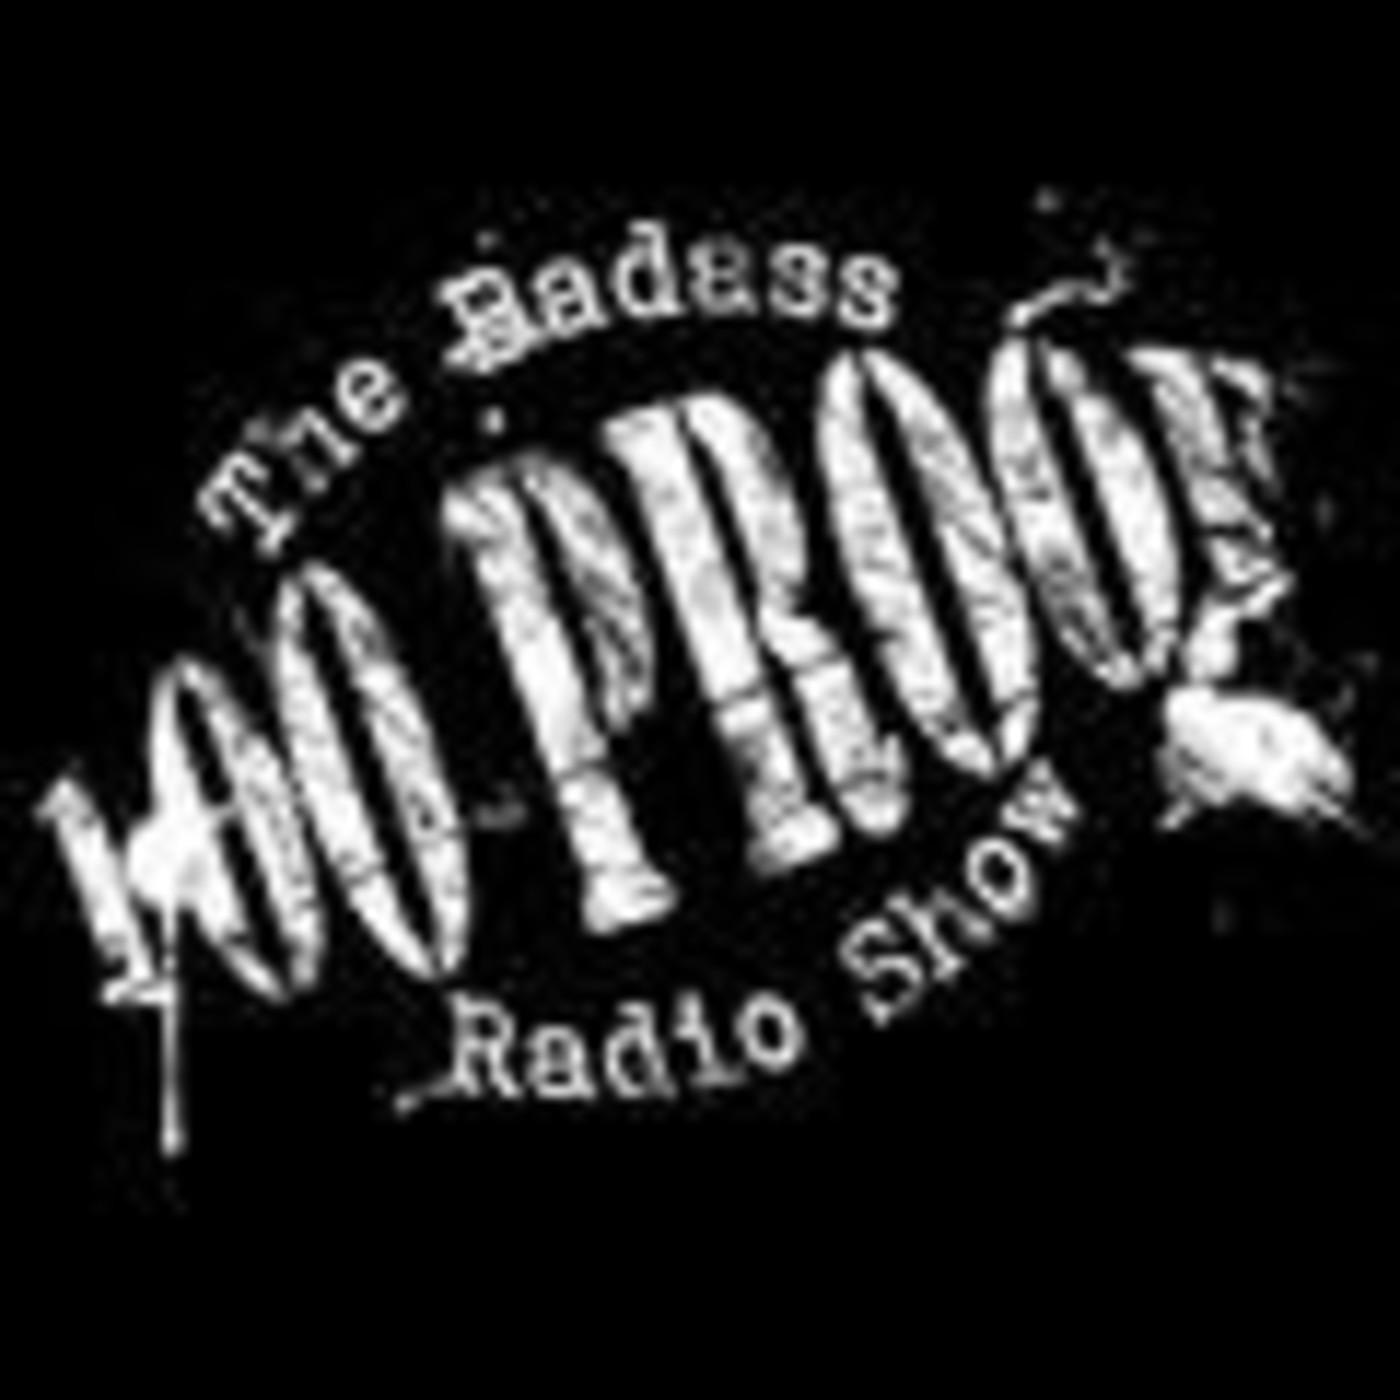 100 Proof - The Badass Radio S